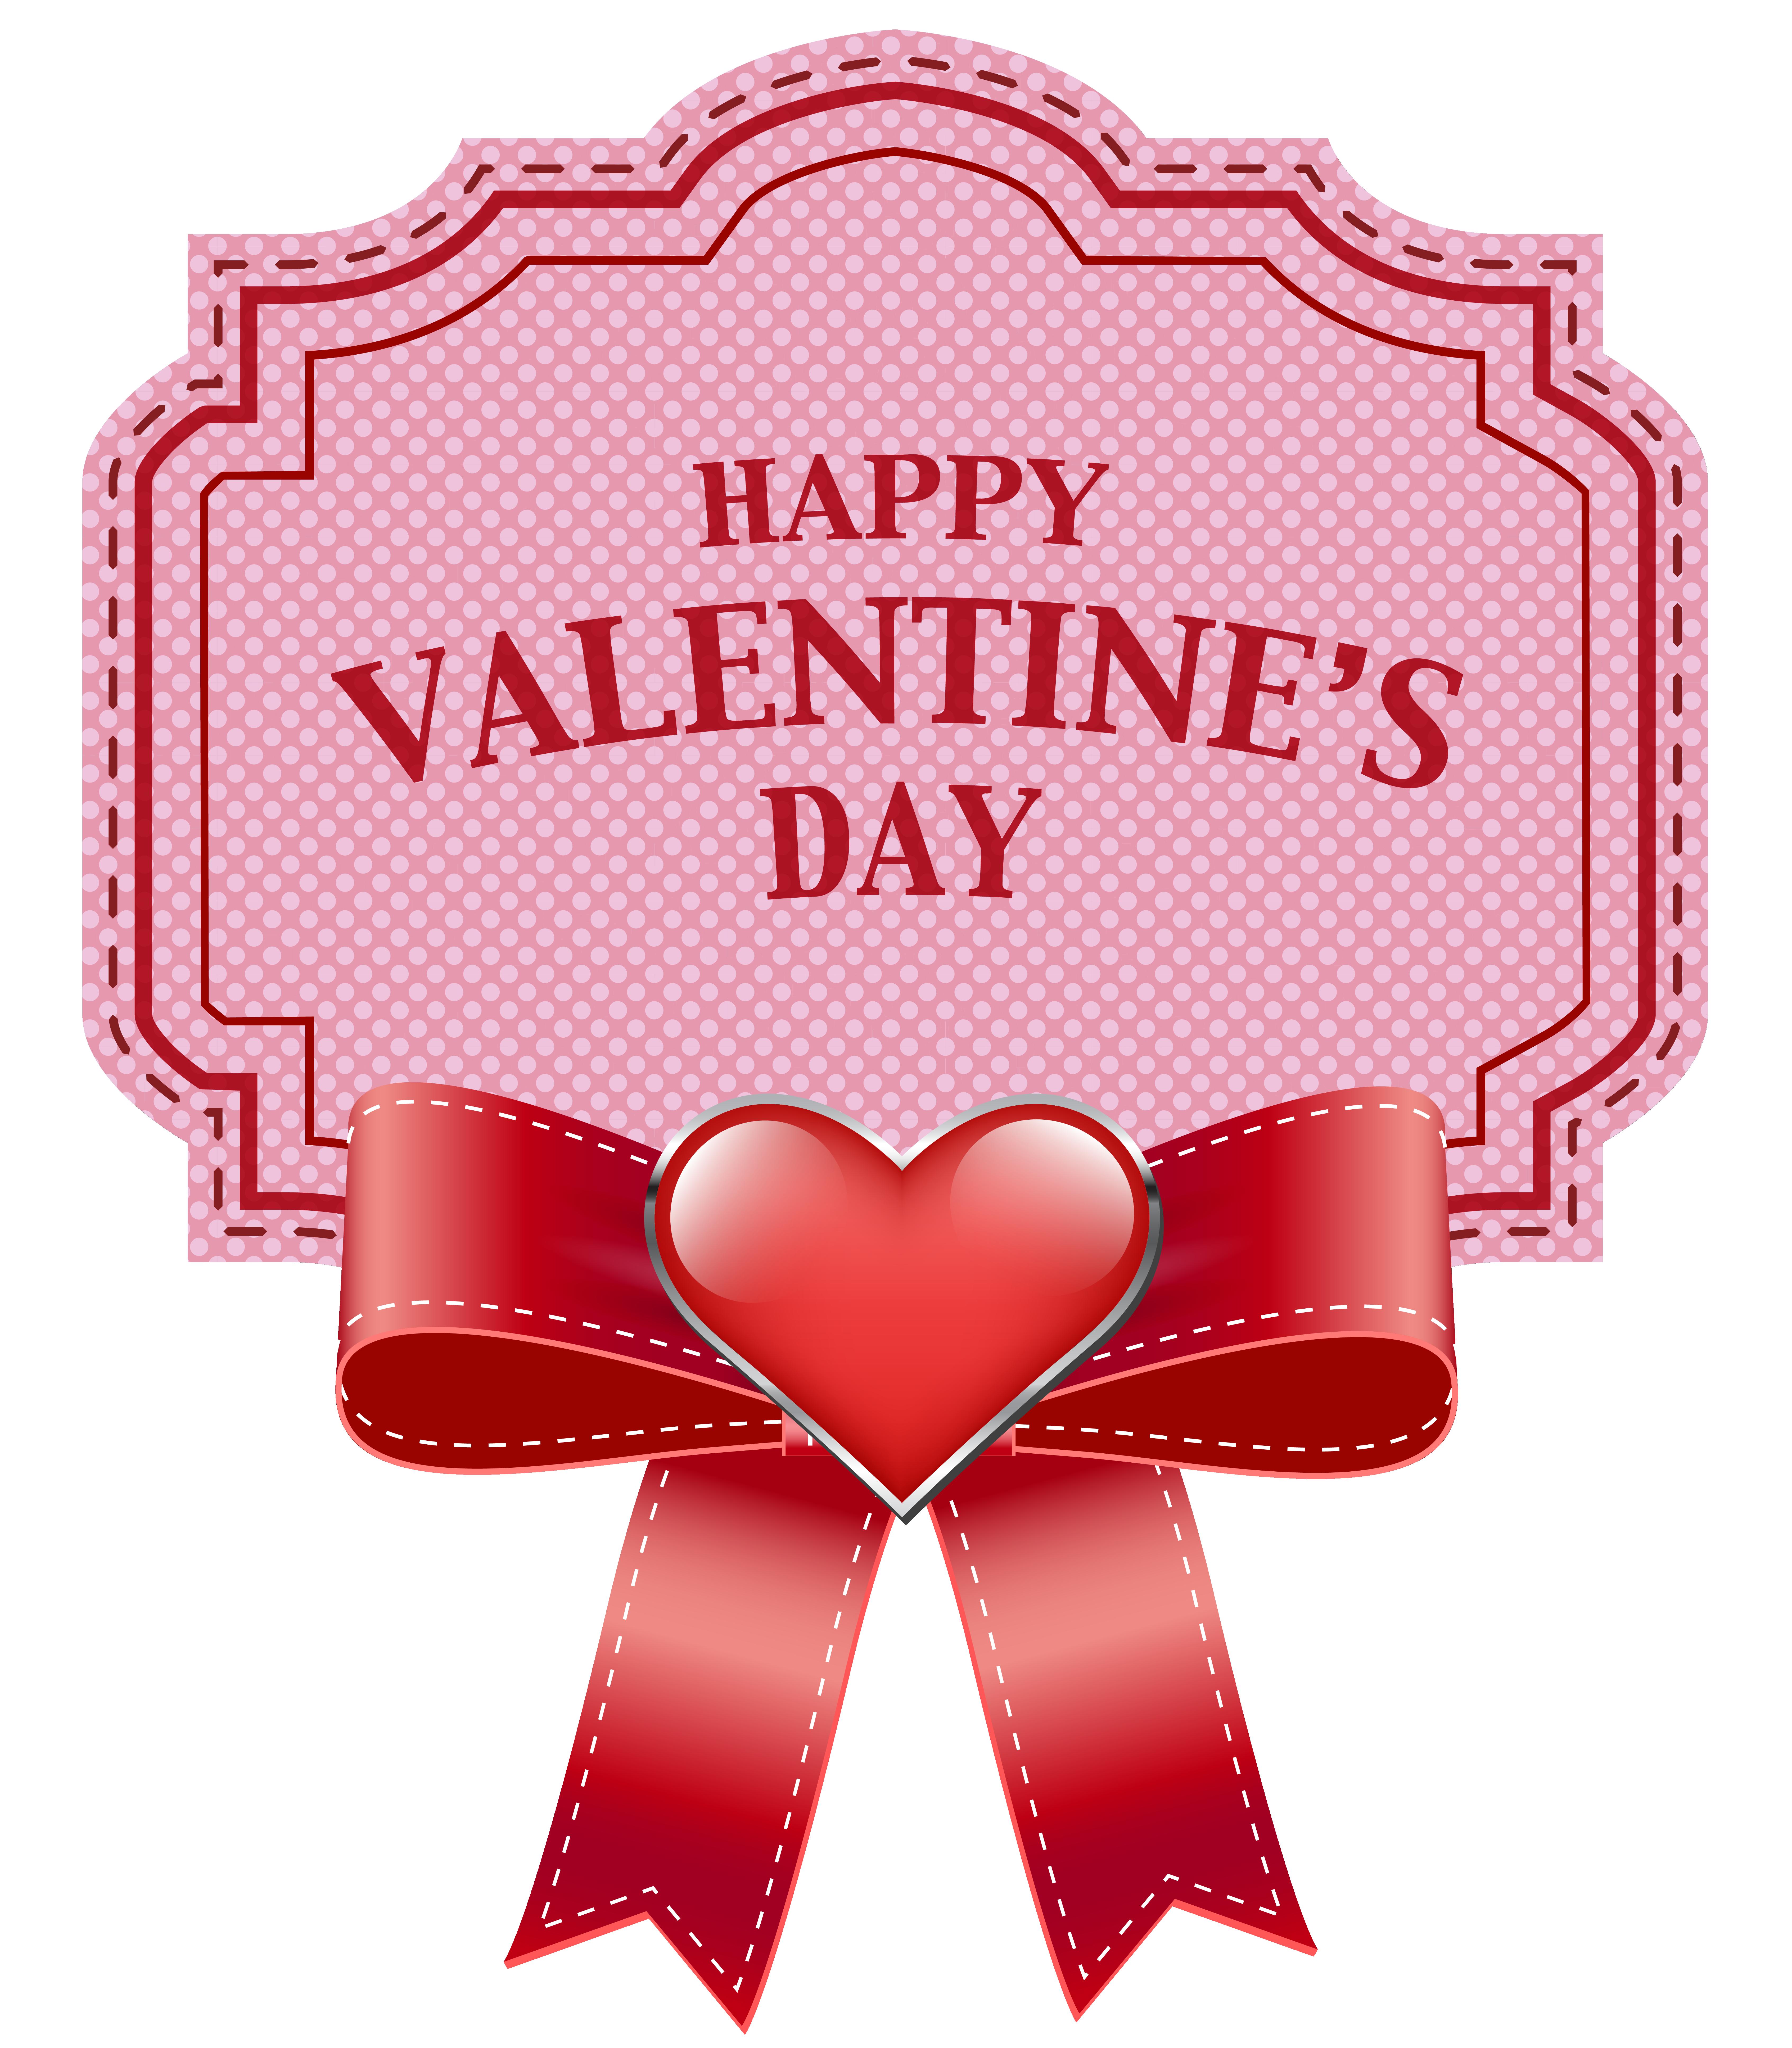 Happy Valentine's Day Label Transparent PNG Clip Art Image.